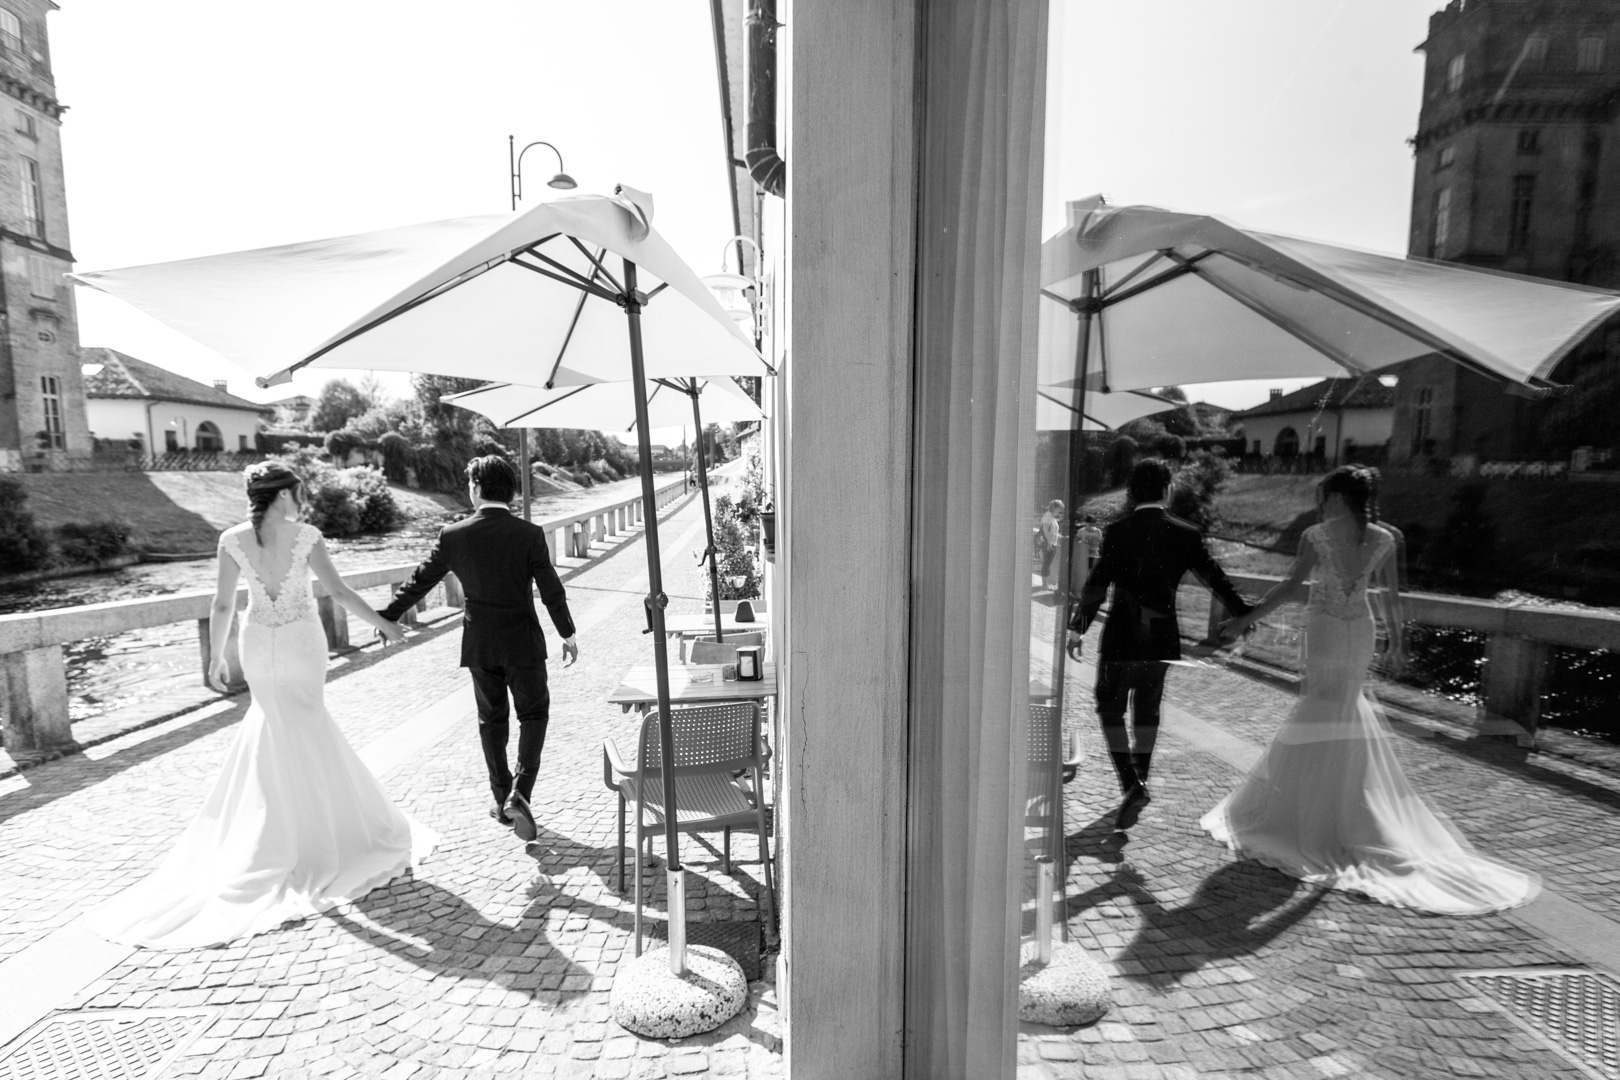 Andreas_Pinacci_Wedding_Photographer-17.